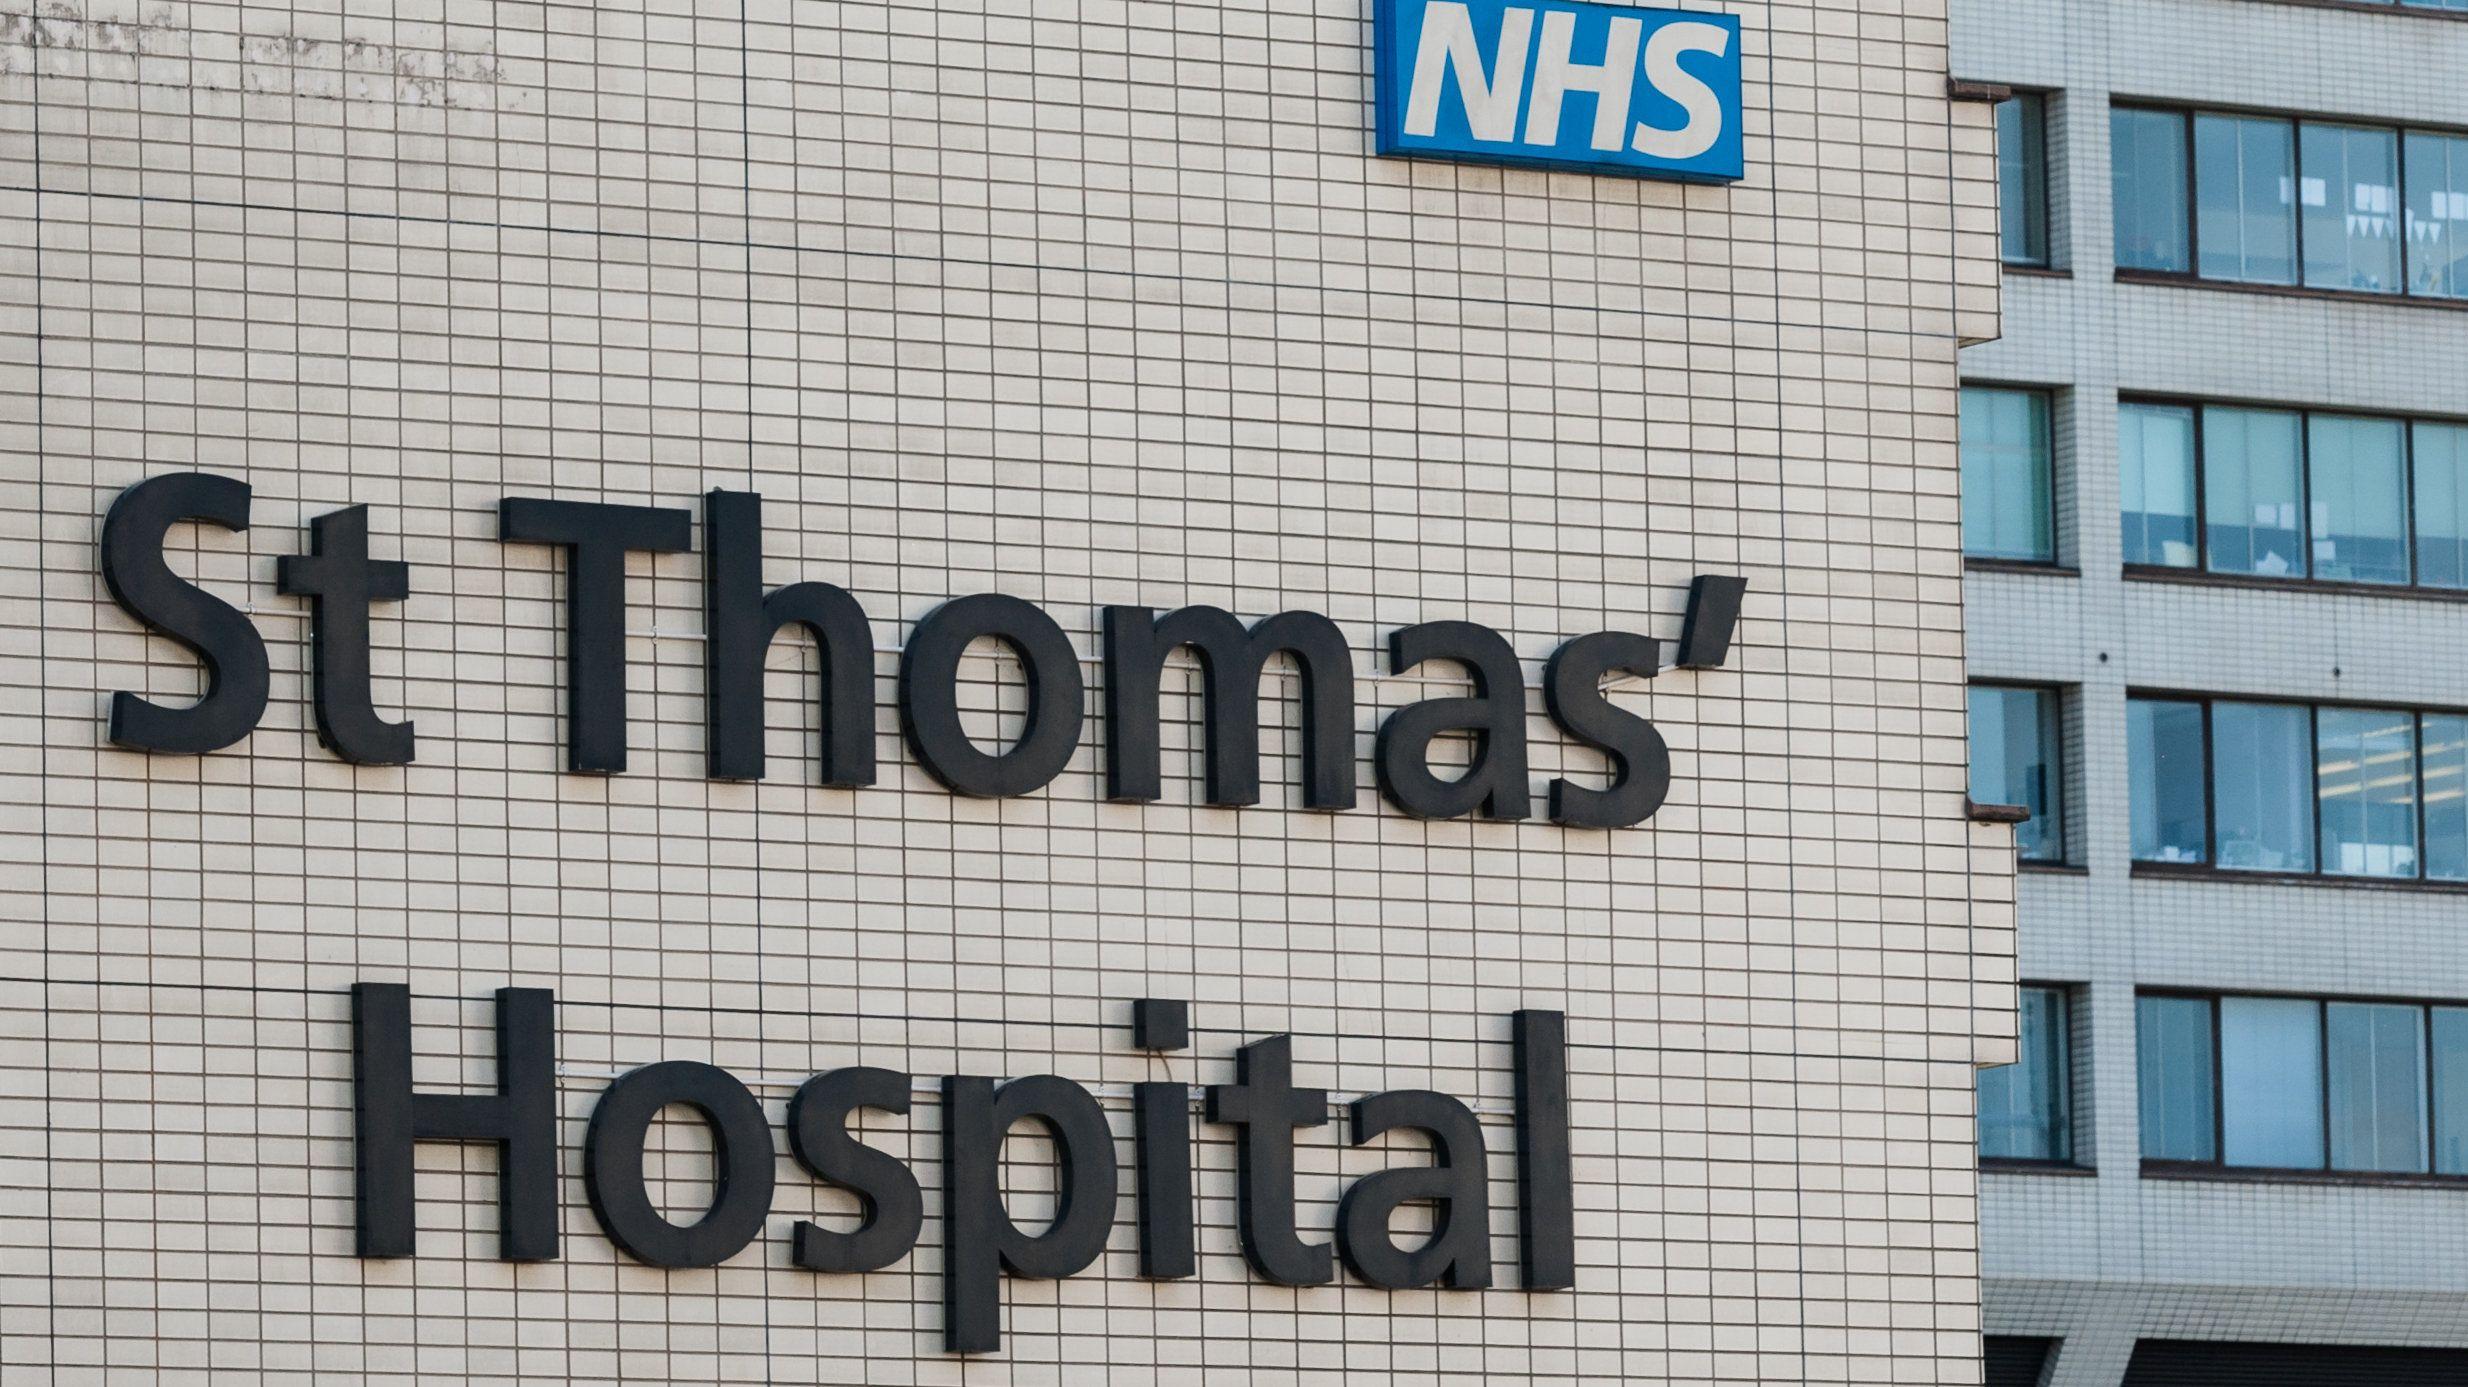 St. Thomas Hospital in London